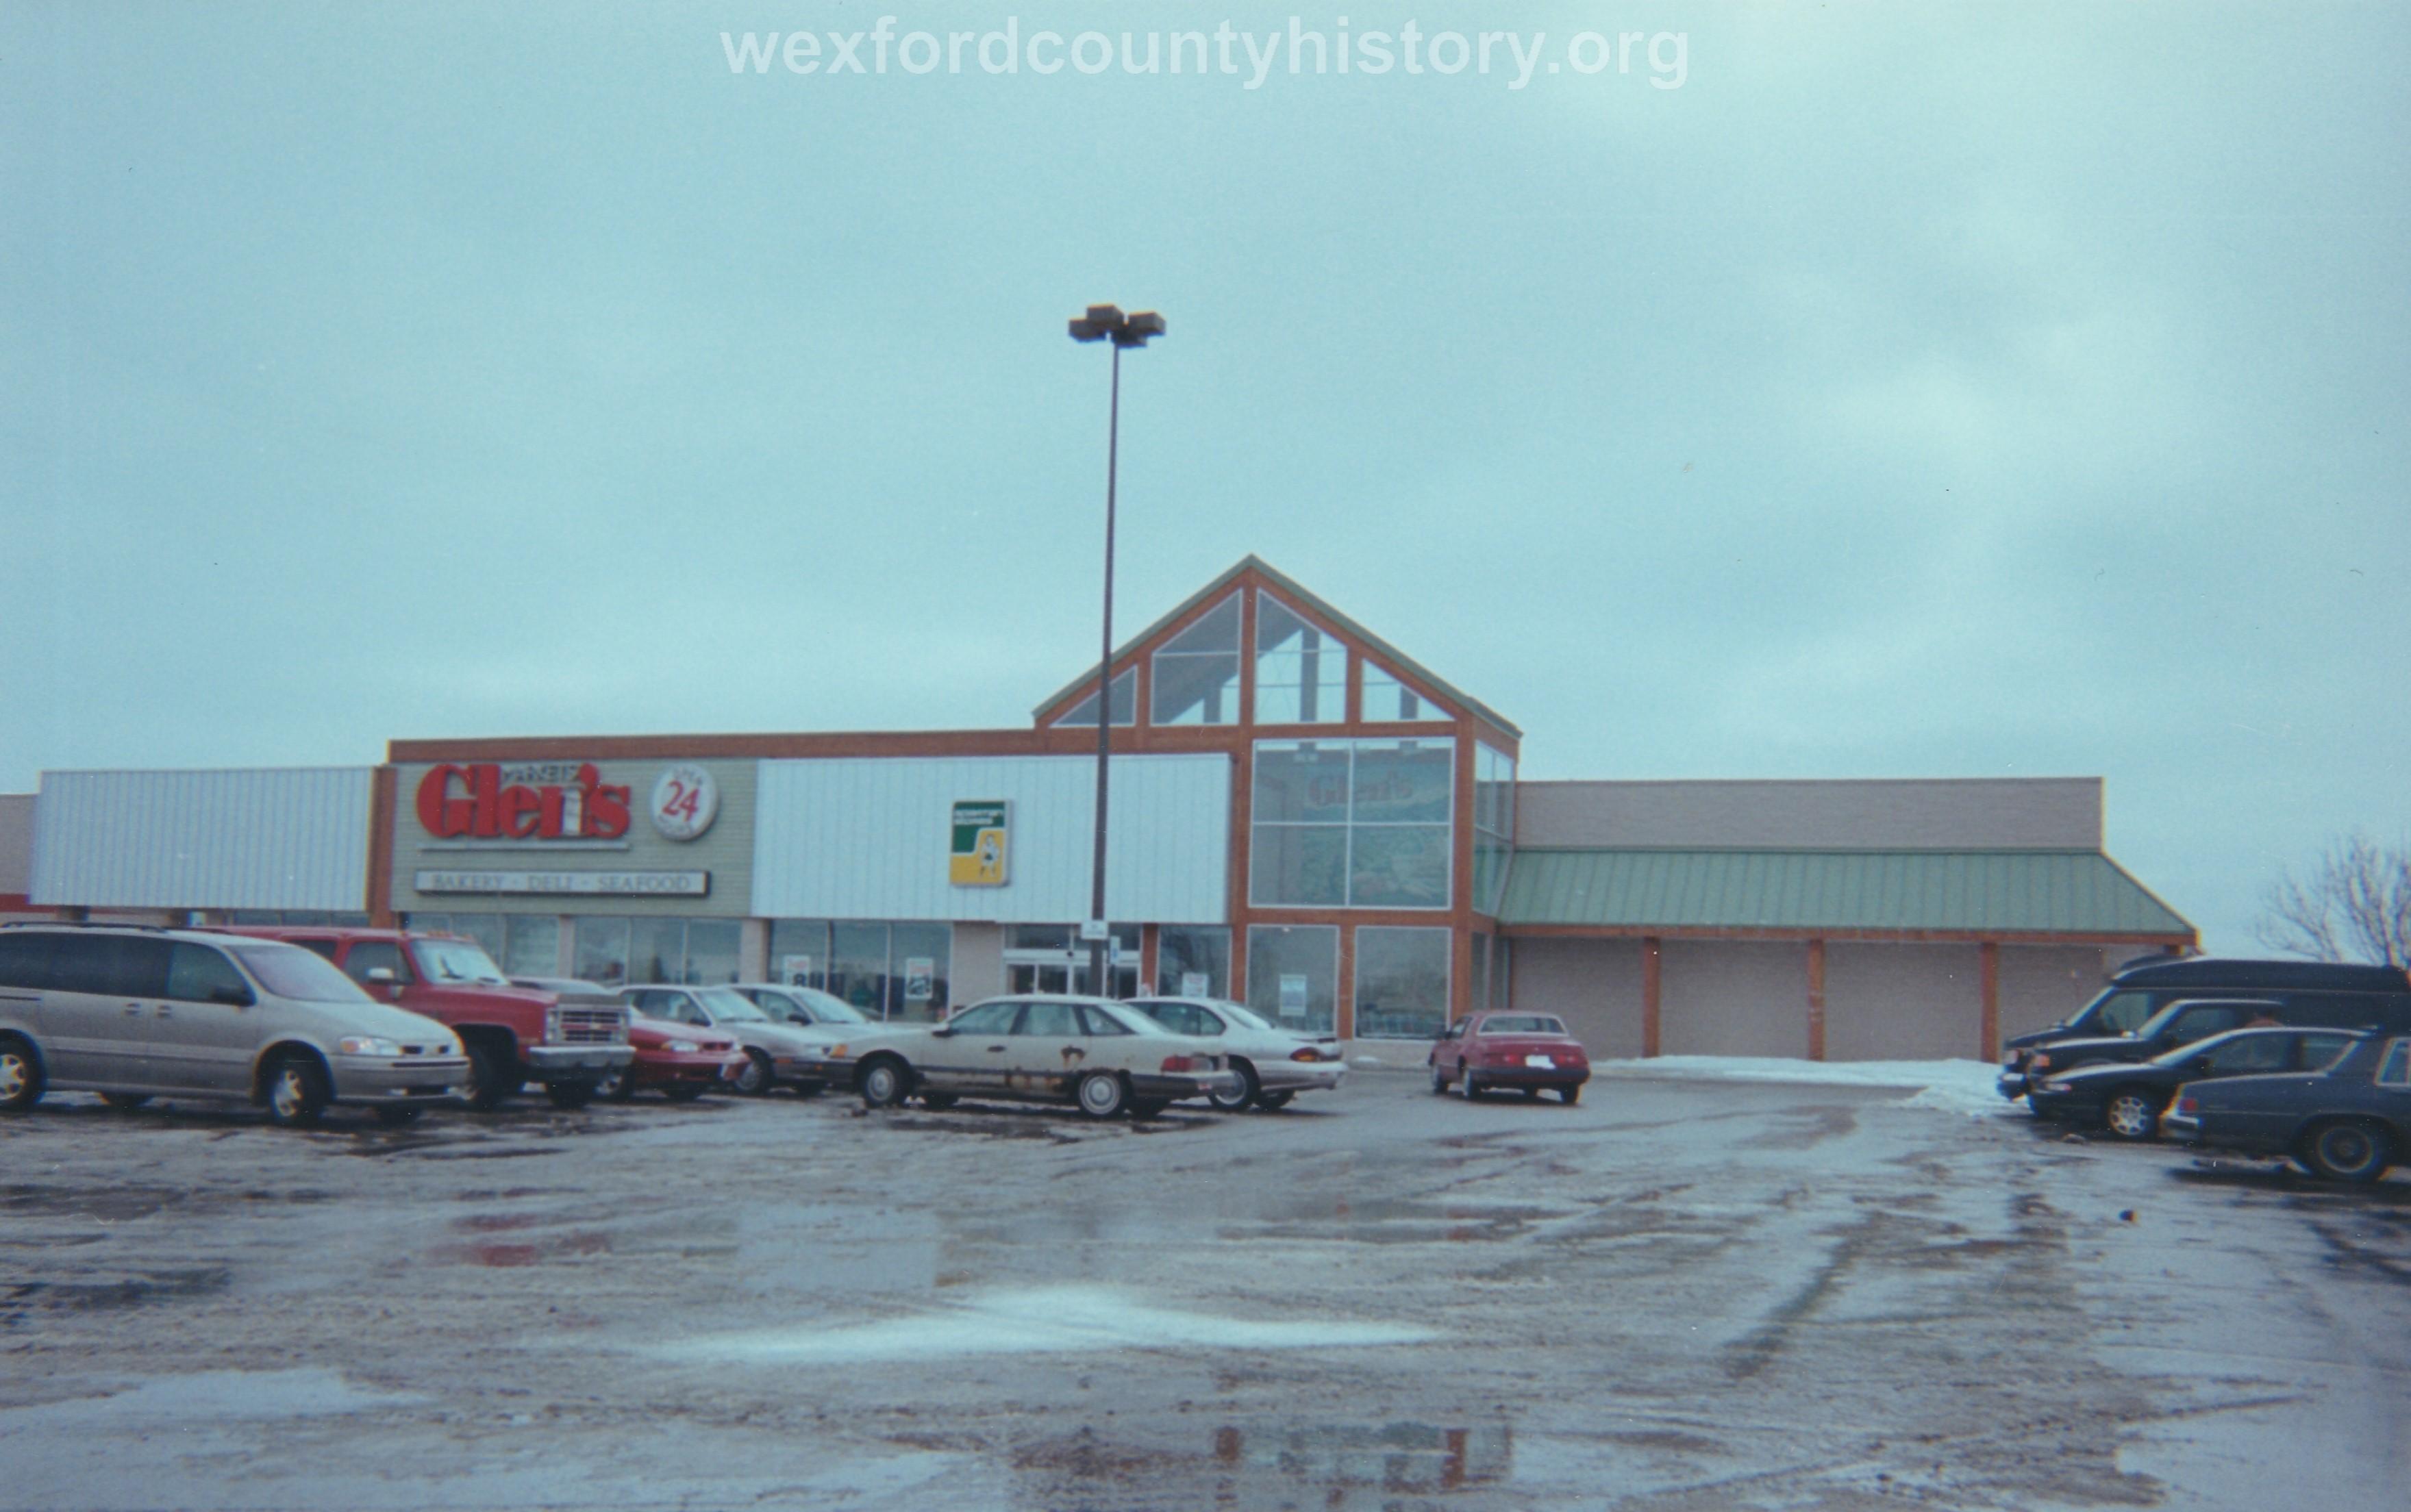 Glen's Supermarket